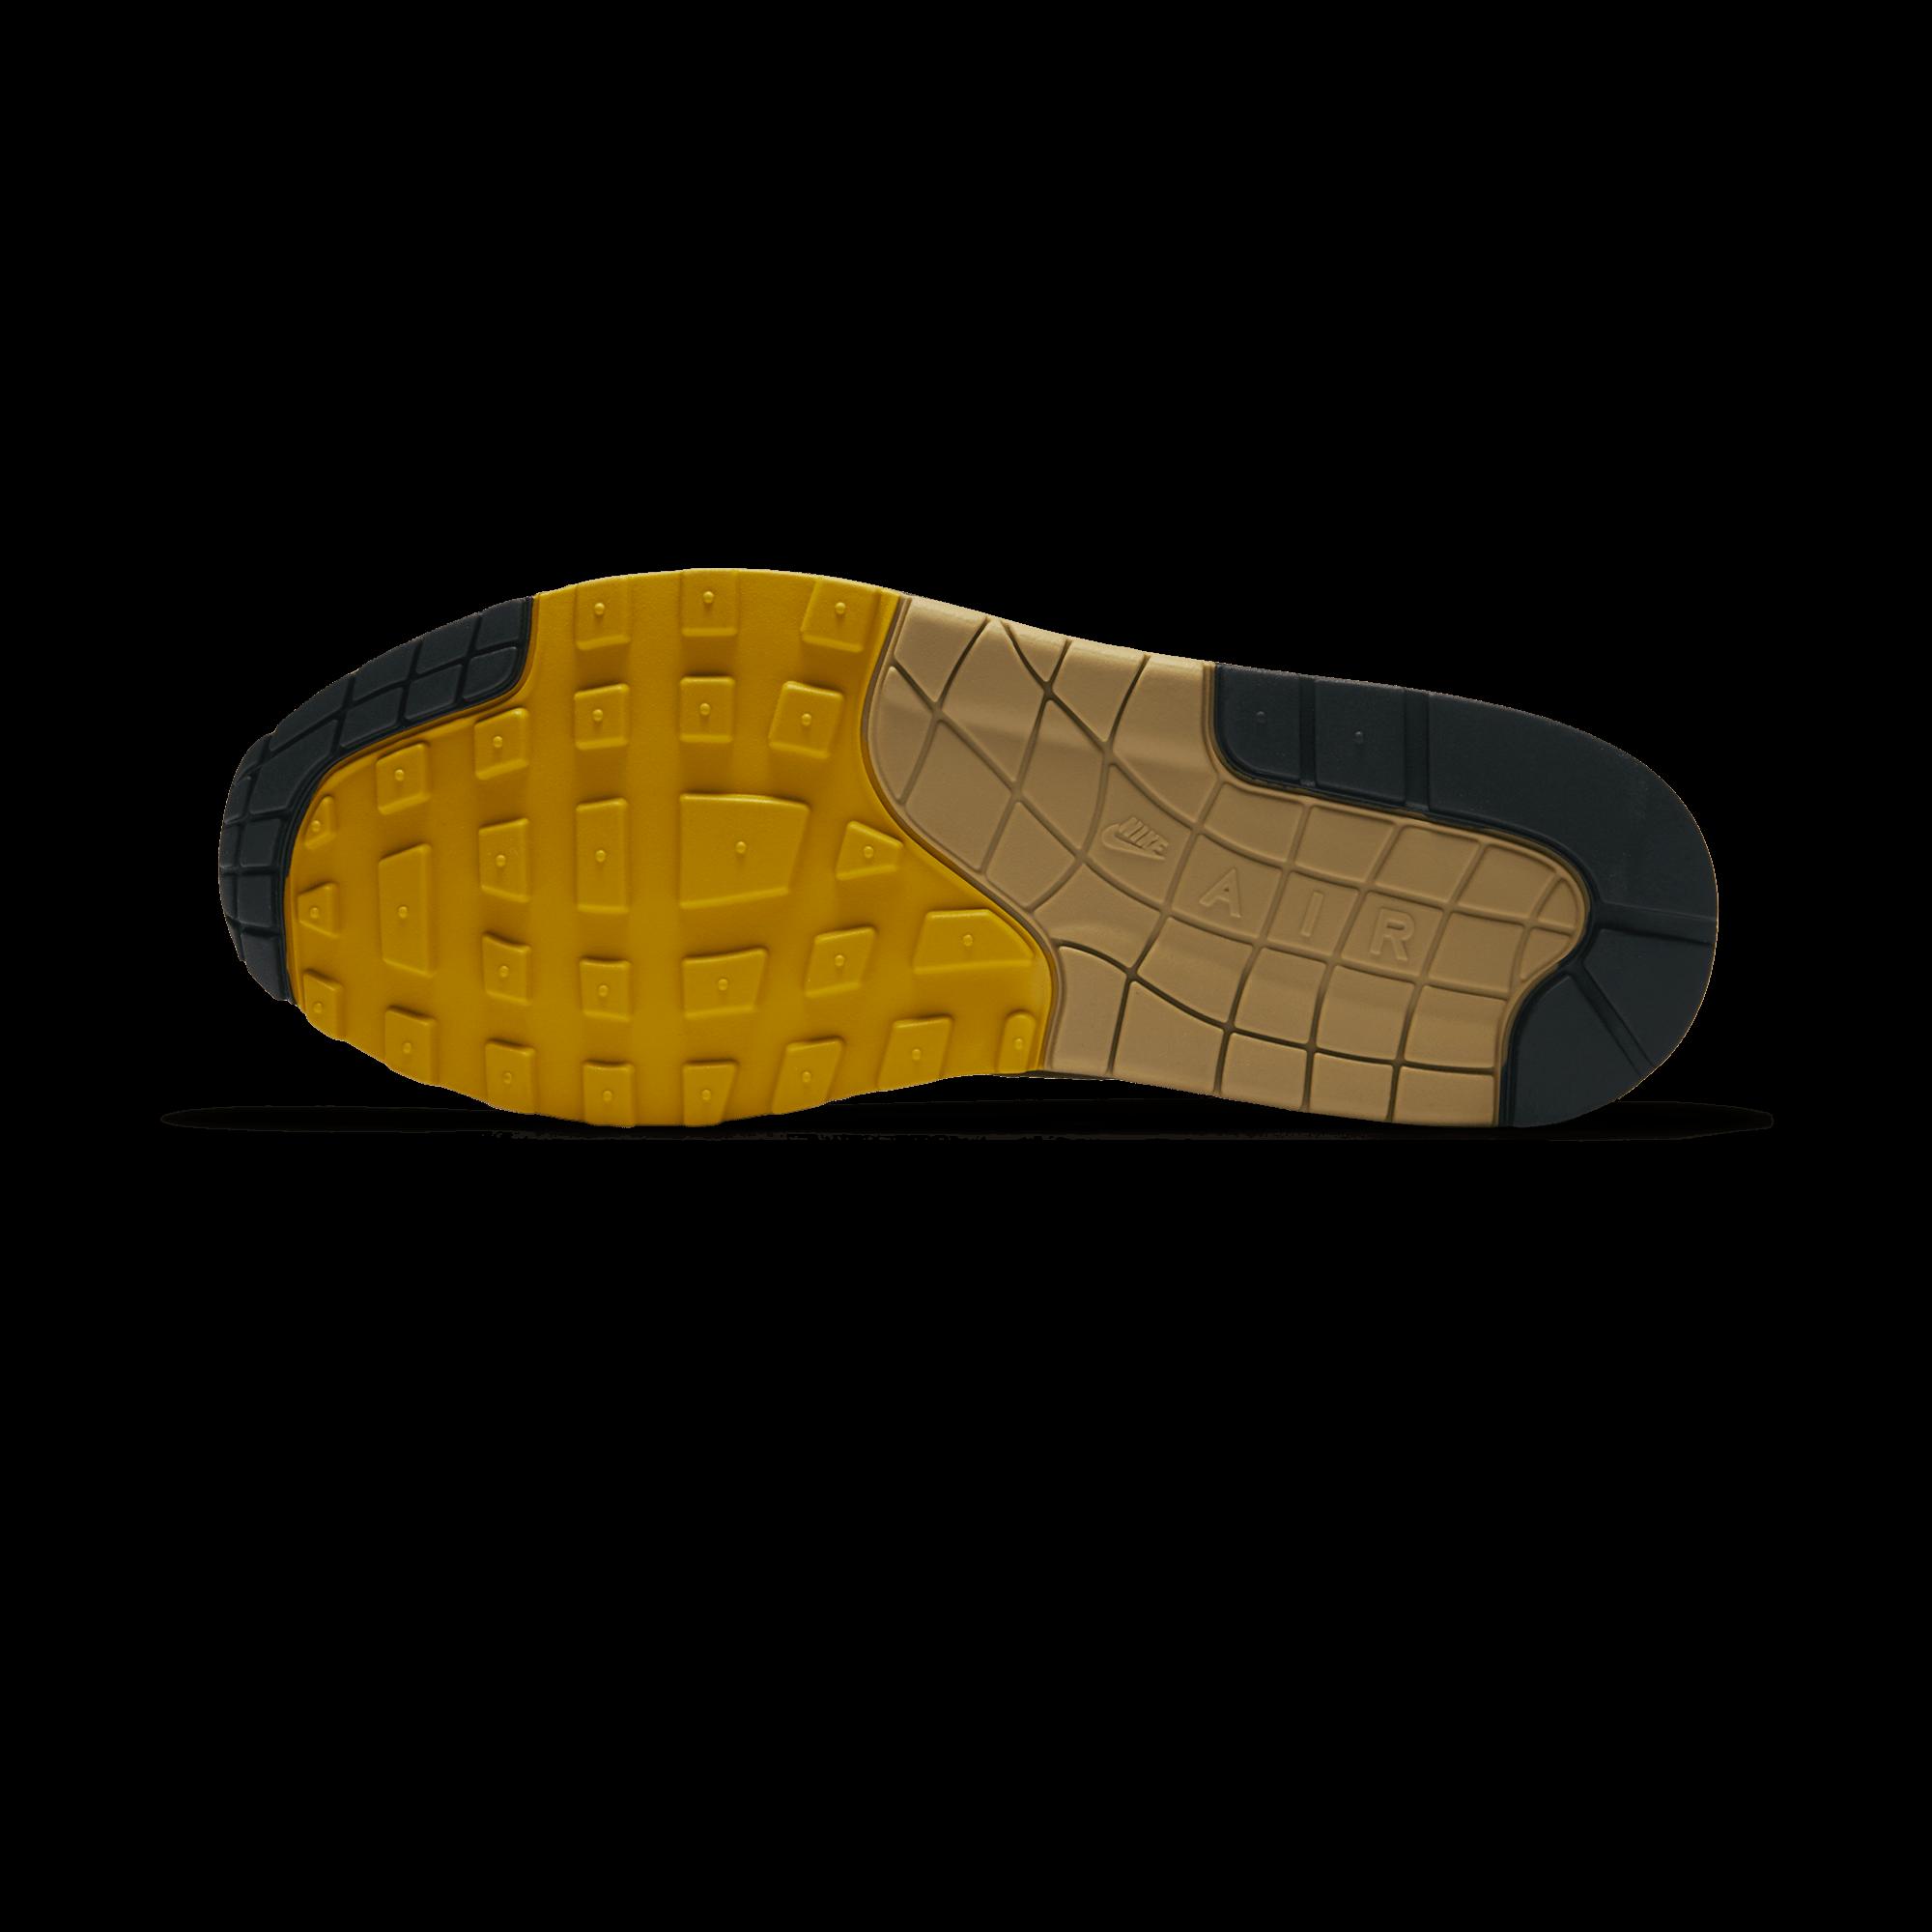 Air Max 1 Premium elemental gold/black